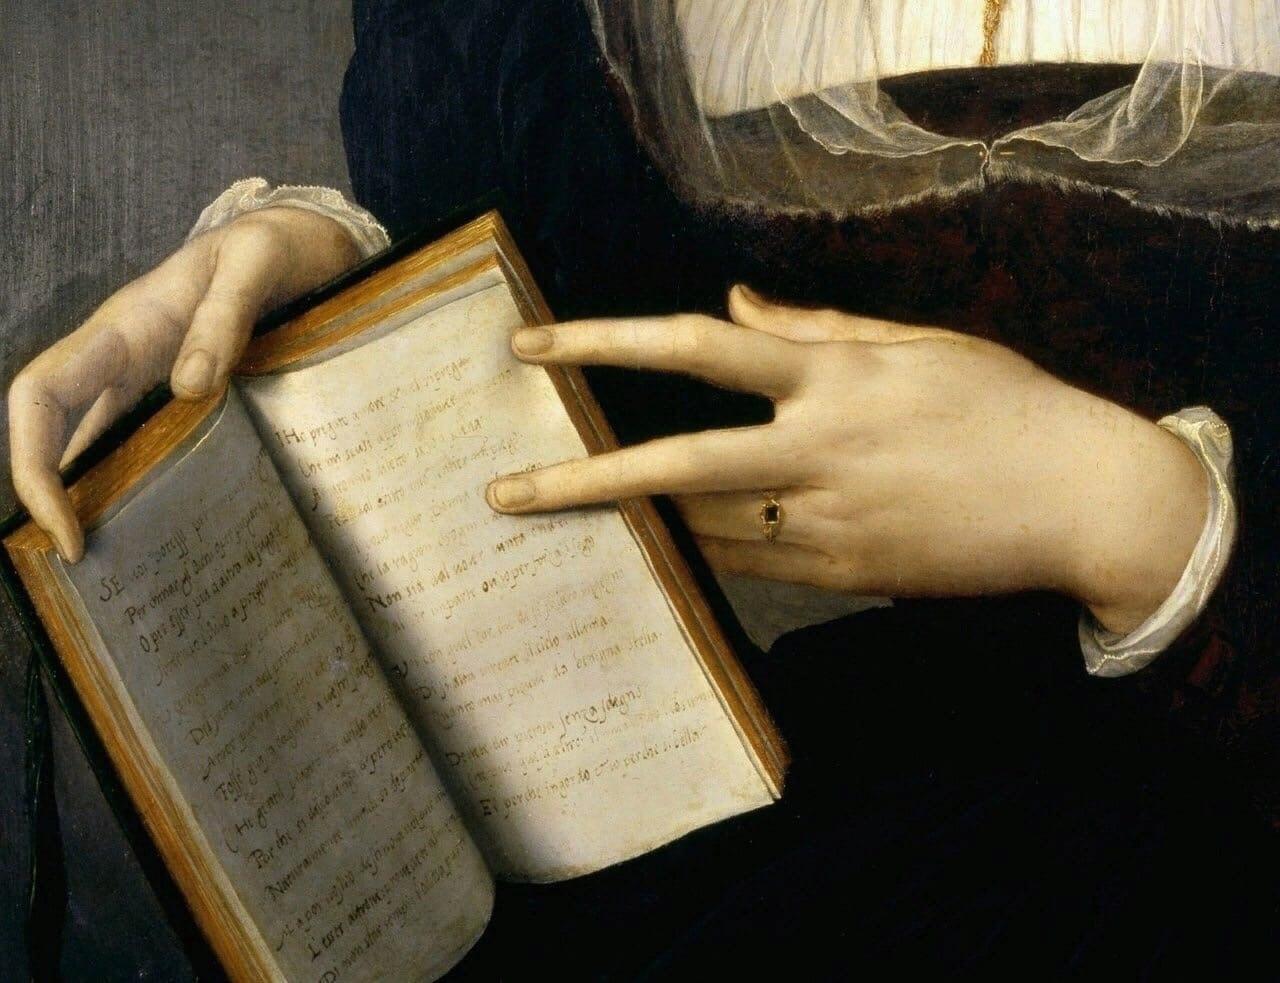 Список рекомендуемой к прочтению литературы. Религиозный канон: «Ригведа» «Яджурведа» «Самаведа» ...